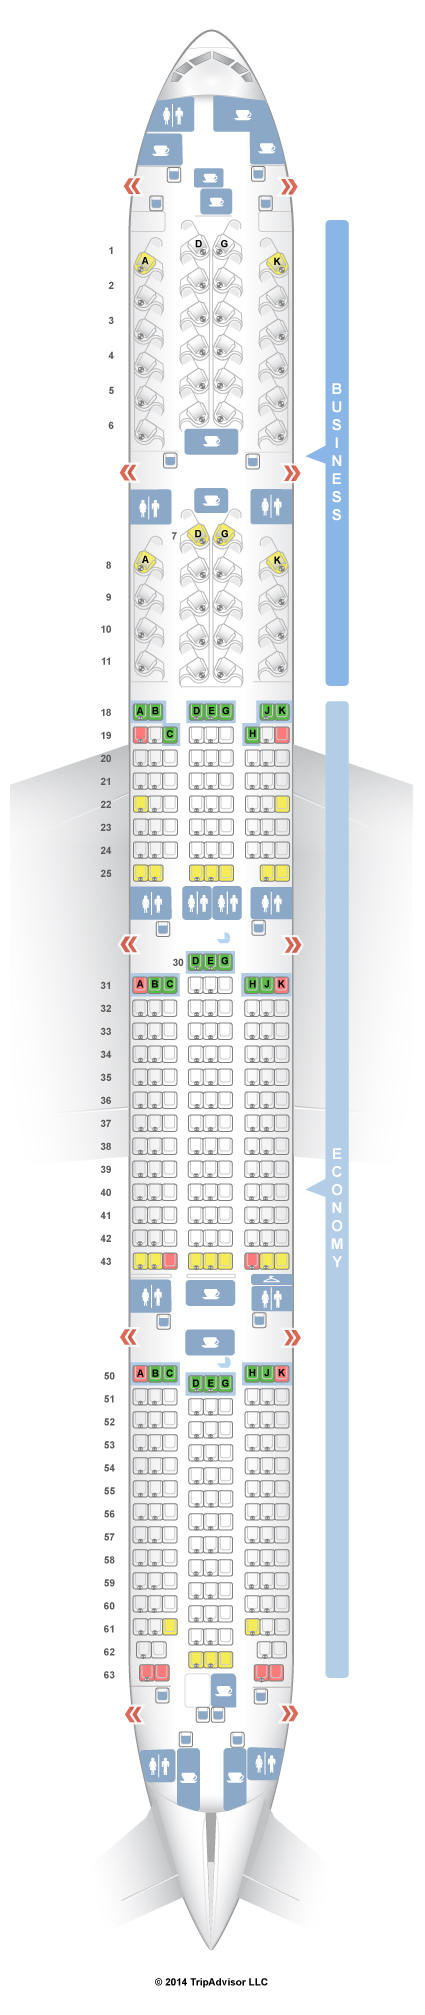 Air Canada Aircraft 77w Seat Map SeatGuru Seat Map Air Canada   SeatGuru